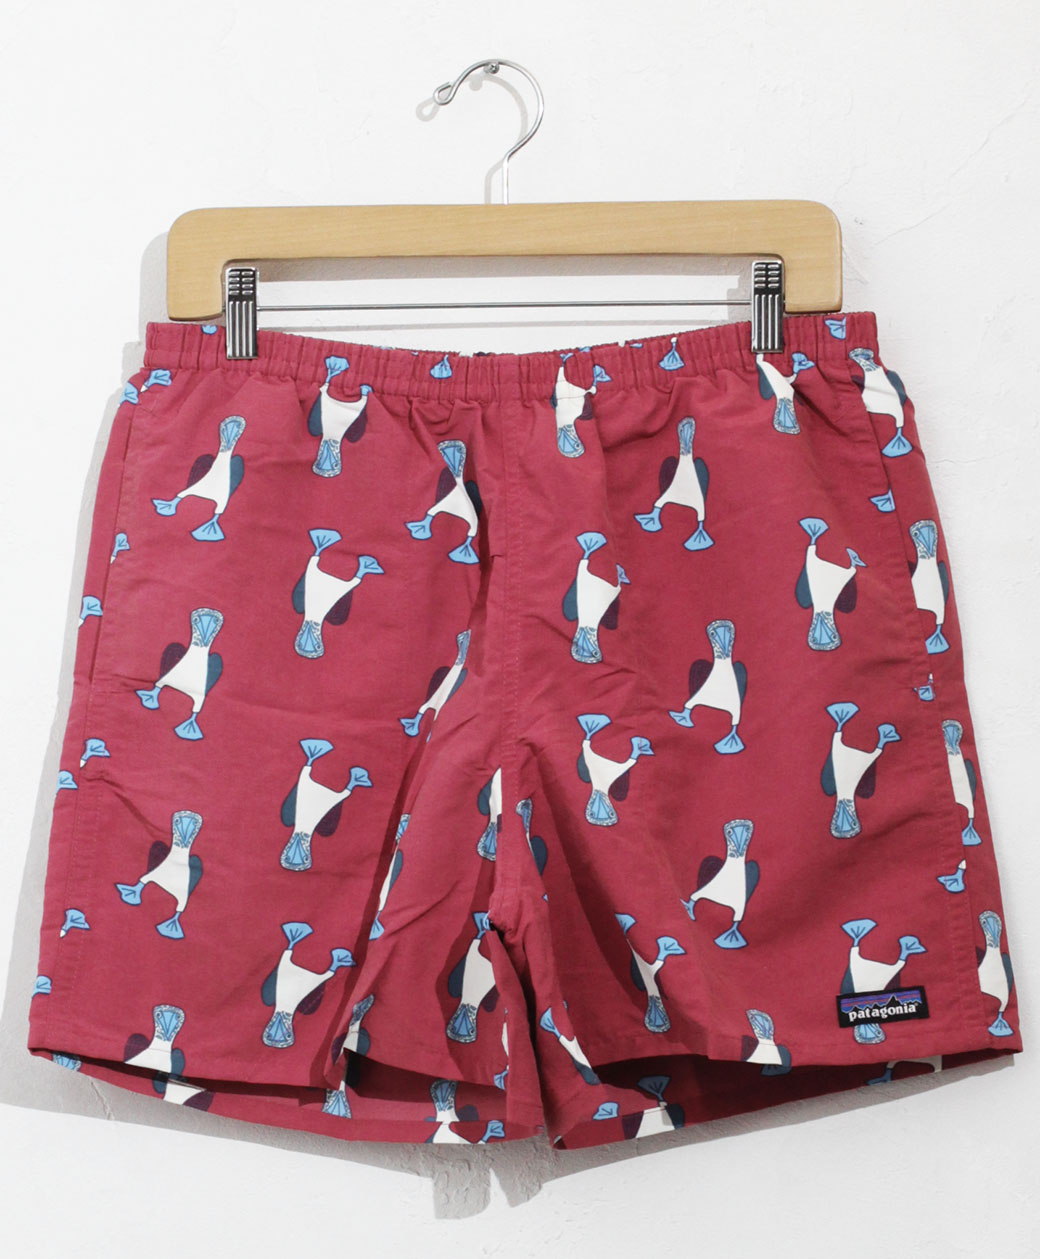 patagonia M's Baggies Shorts 5(BPPI)